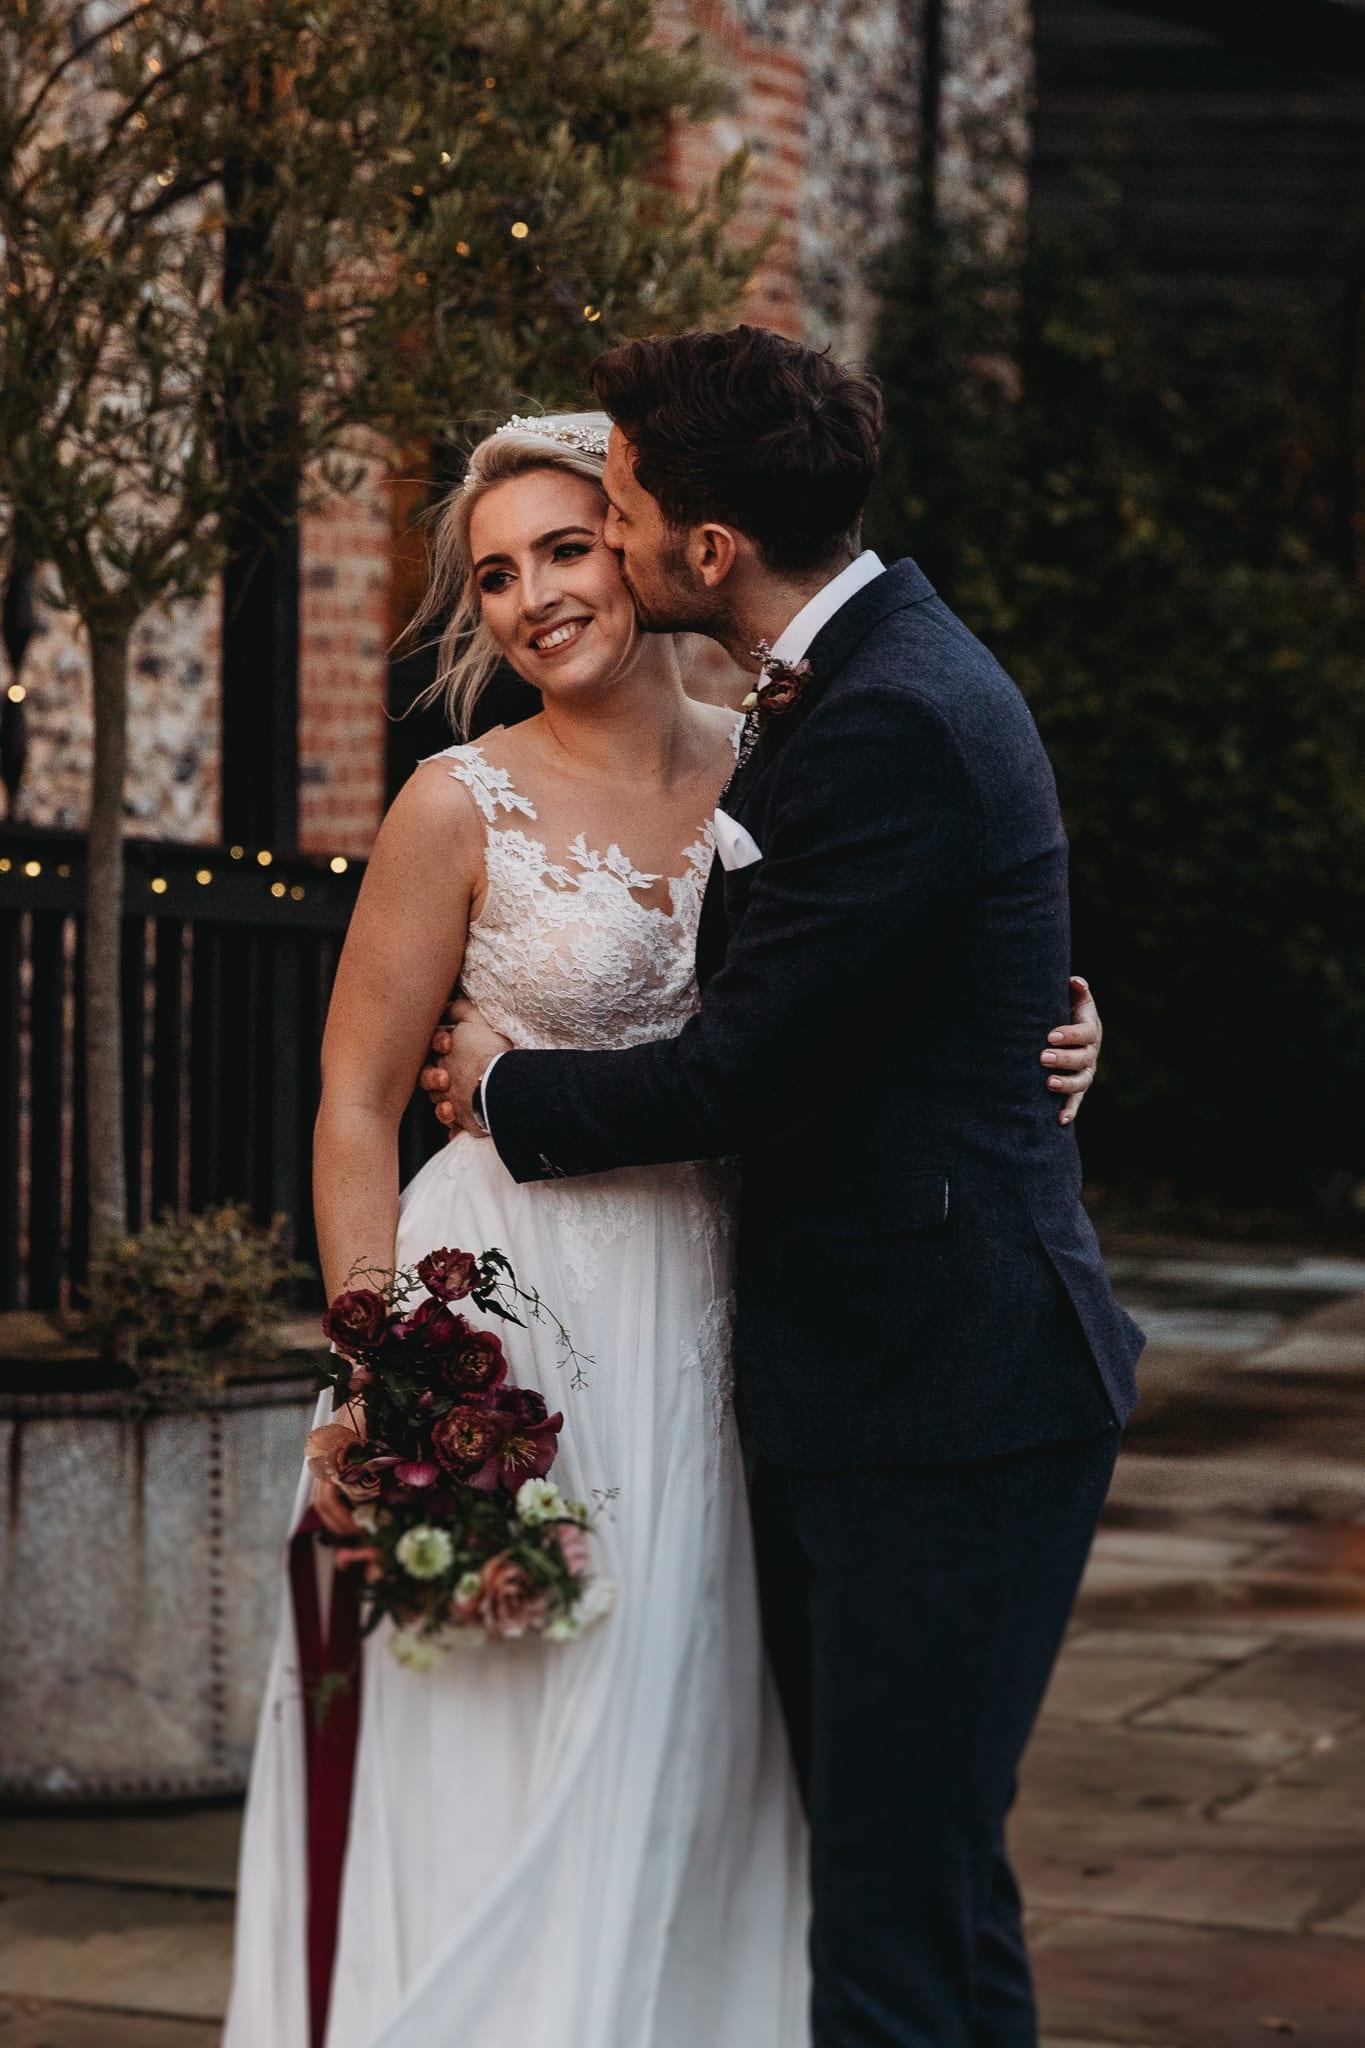 groom kissing bride's face at Granary Estates Intimate wedding